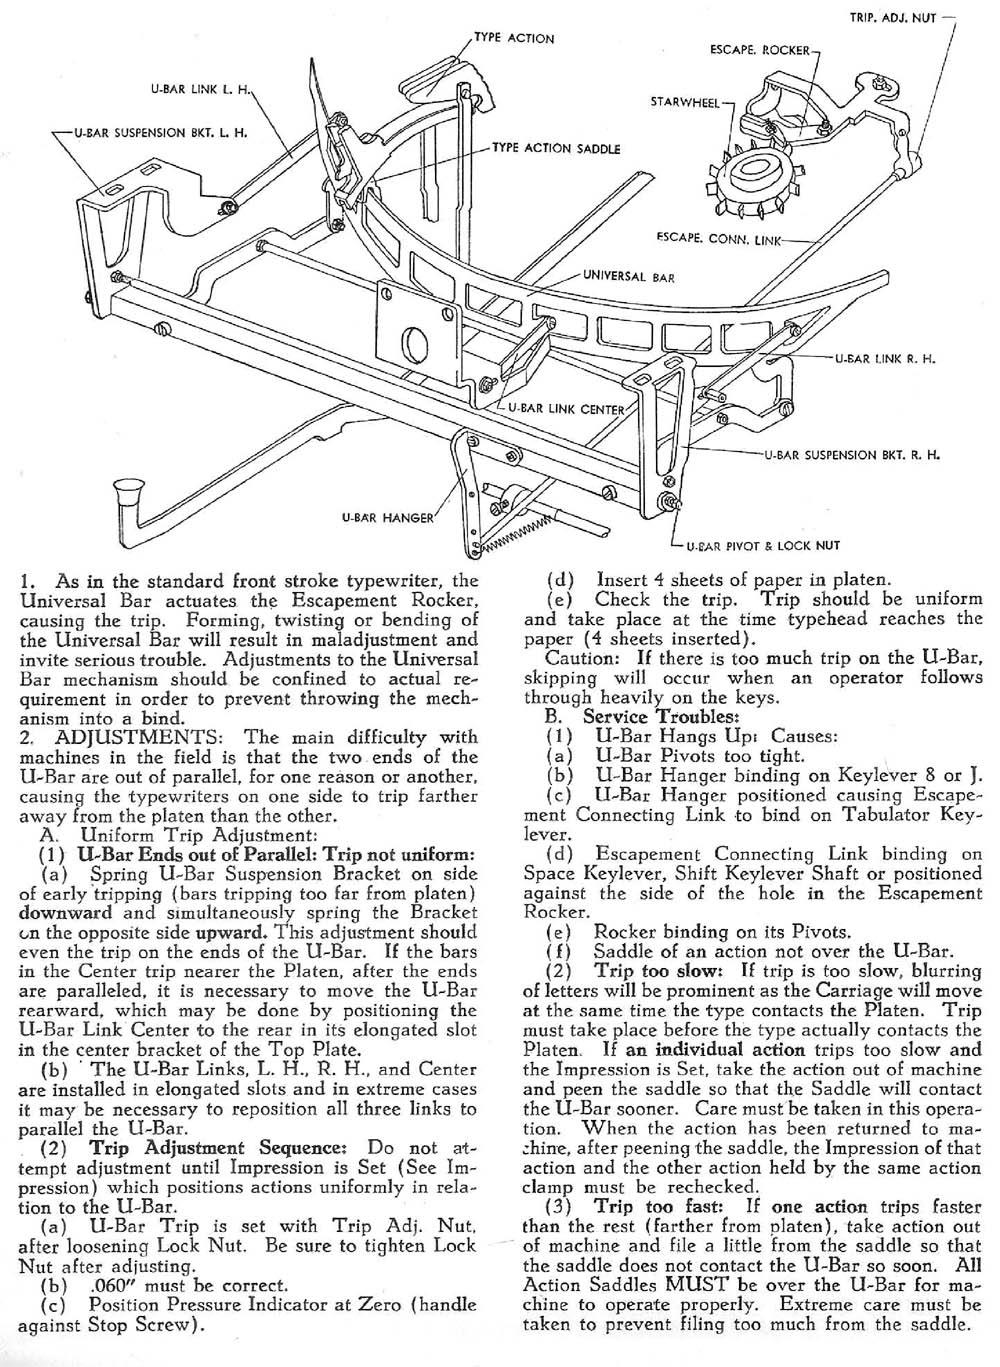 Noiseless Typewriters AMES OAMI Mechanical Training Manual